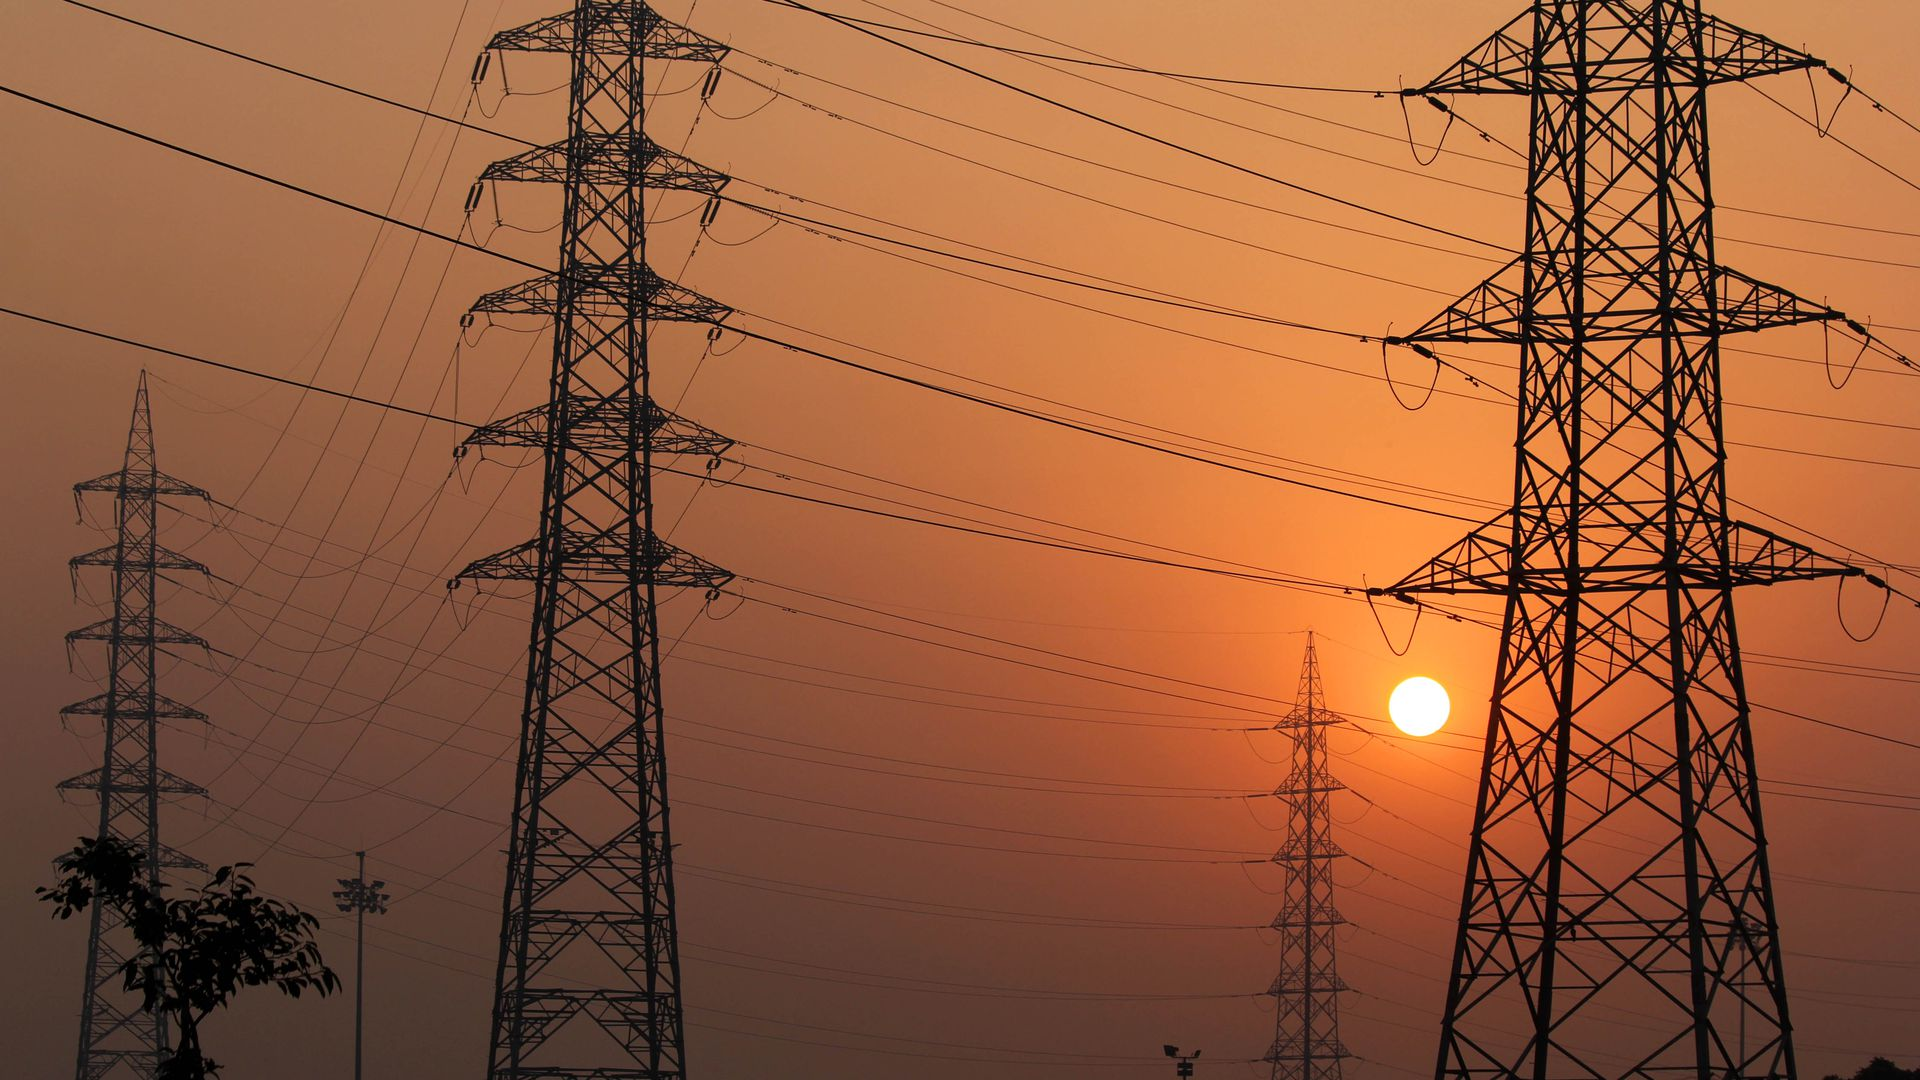 electicity deregulation